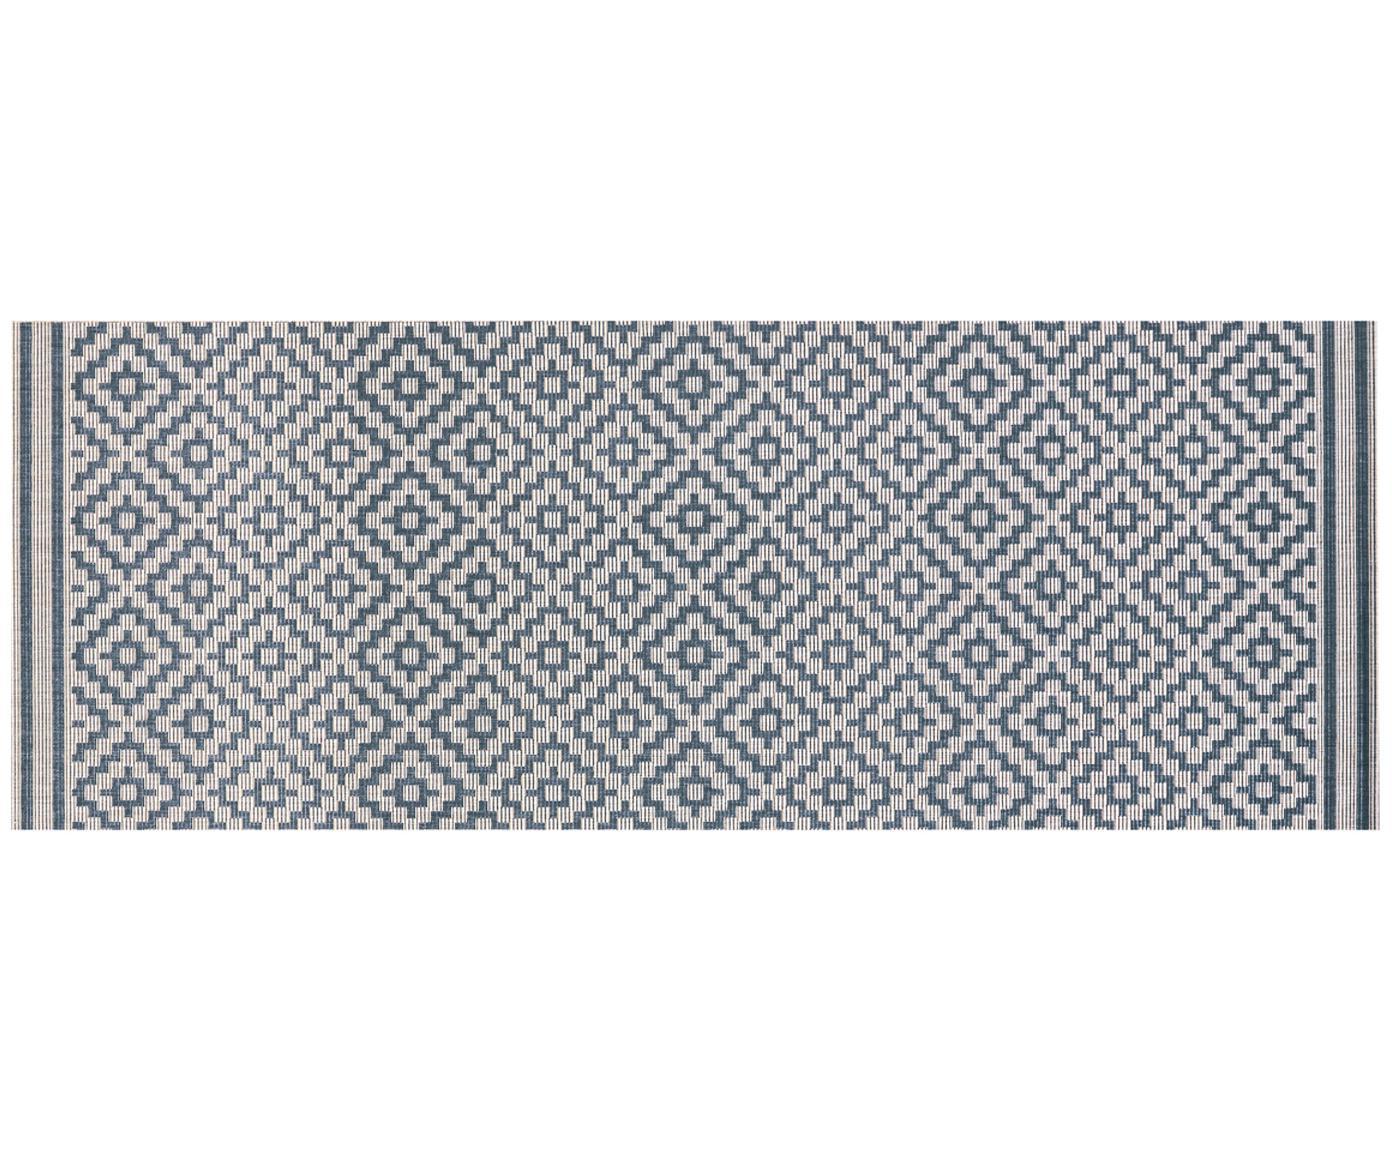 Alfombra de interior/exterior Meadow Raute, Azul, crema, An 80 x L 200 cm